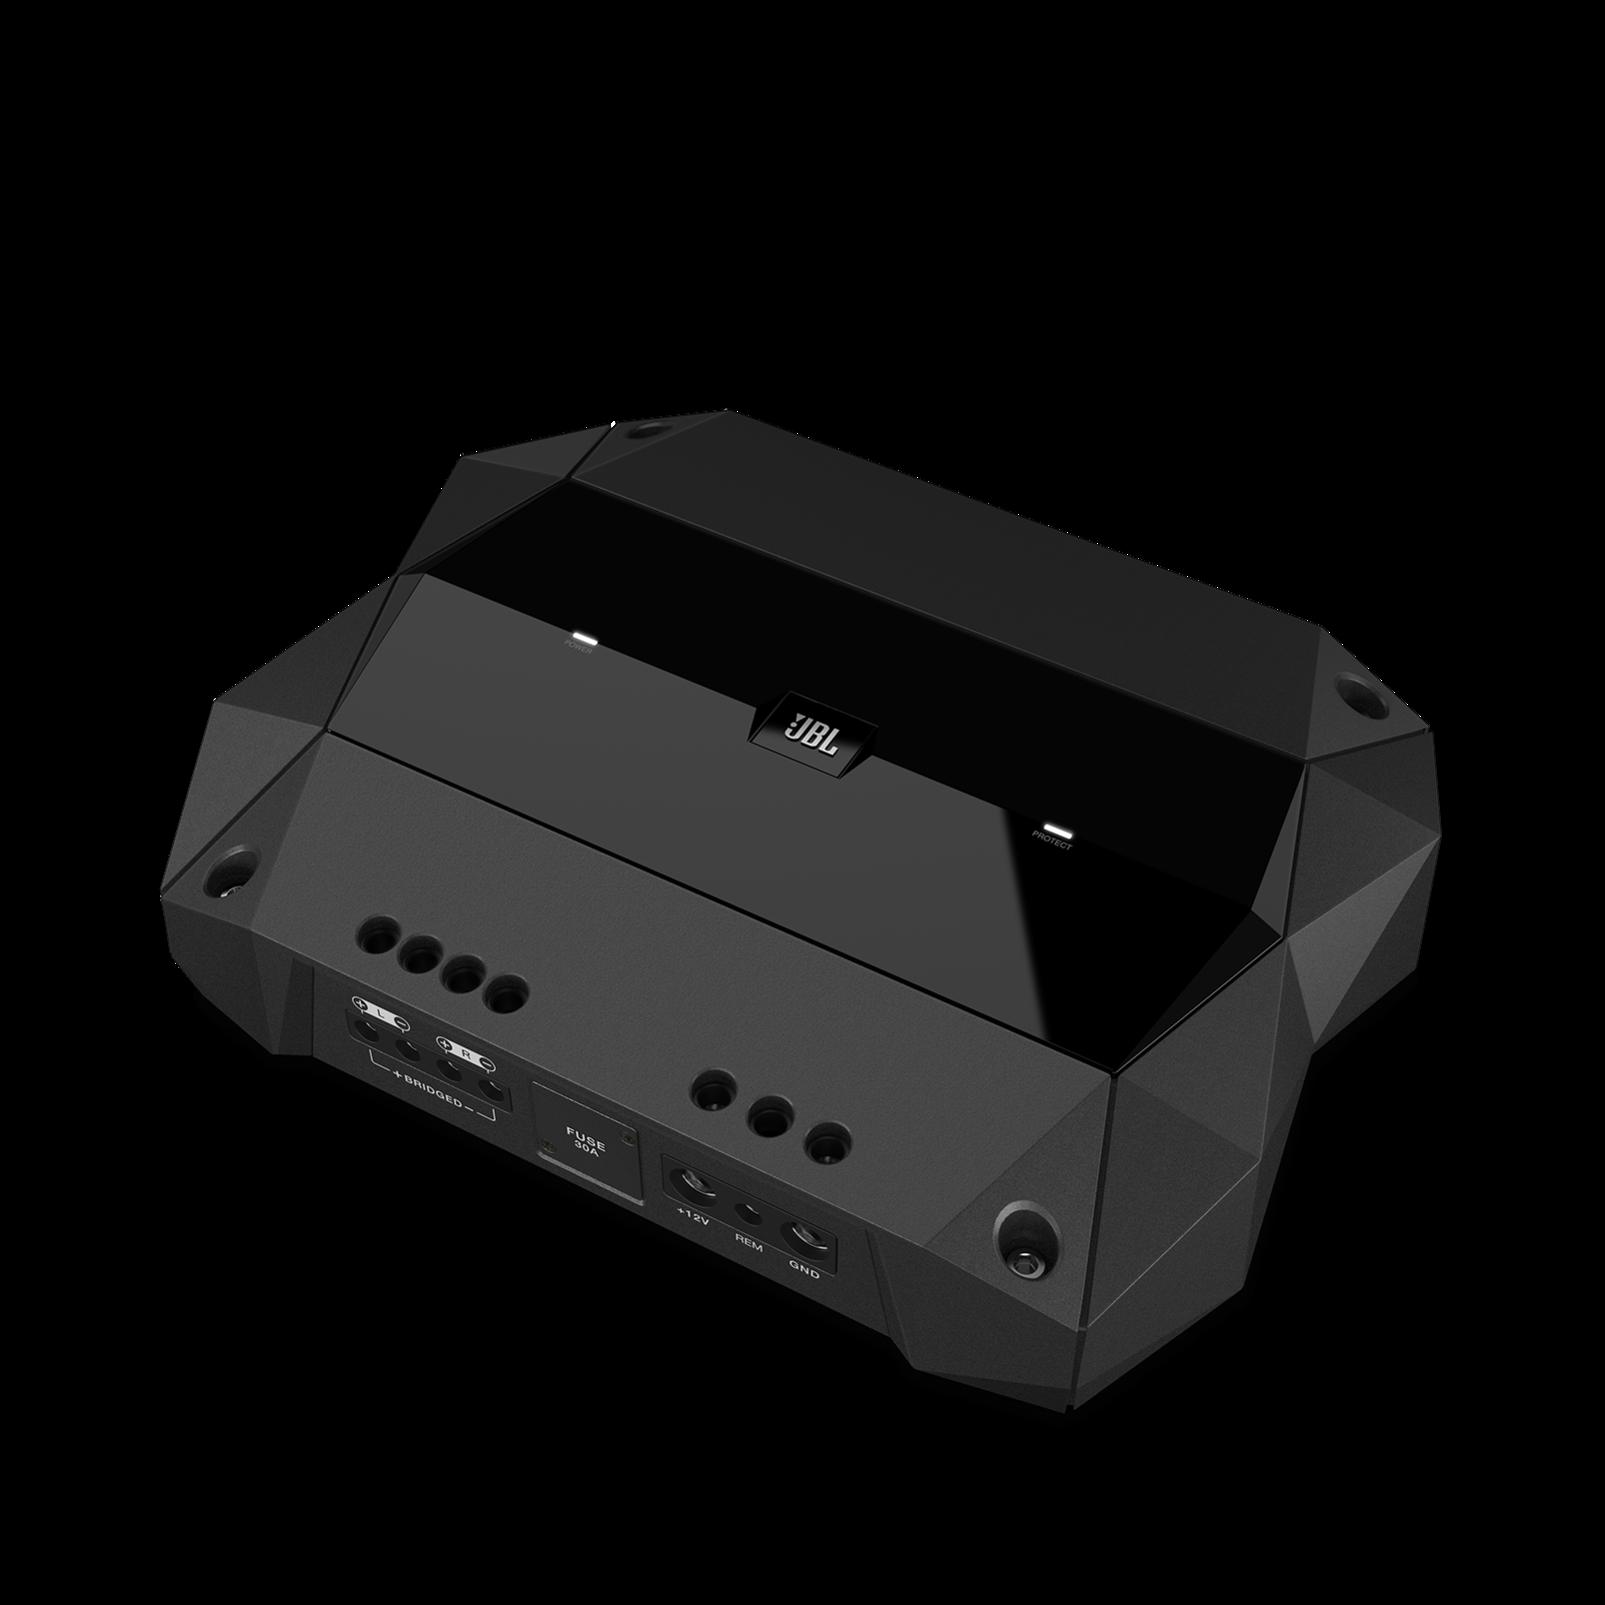 Club 5501 - Black - high-performance mono car amplifier - Hero